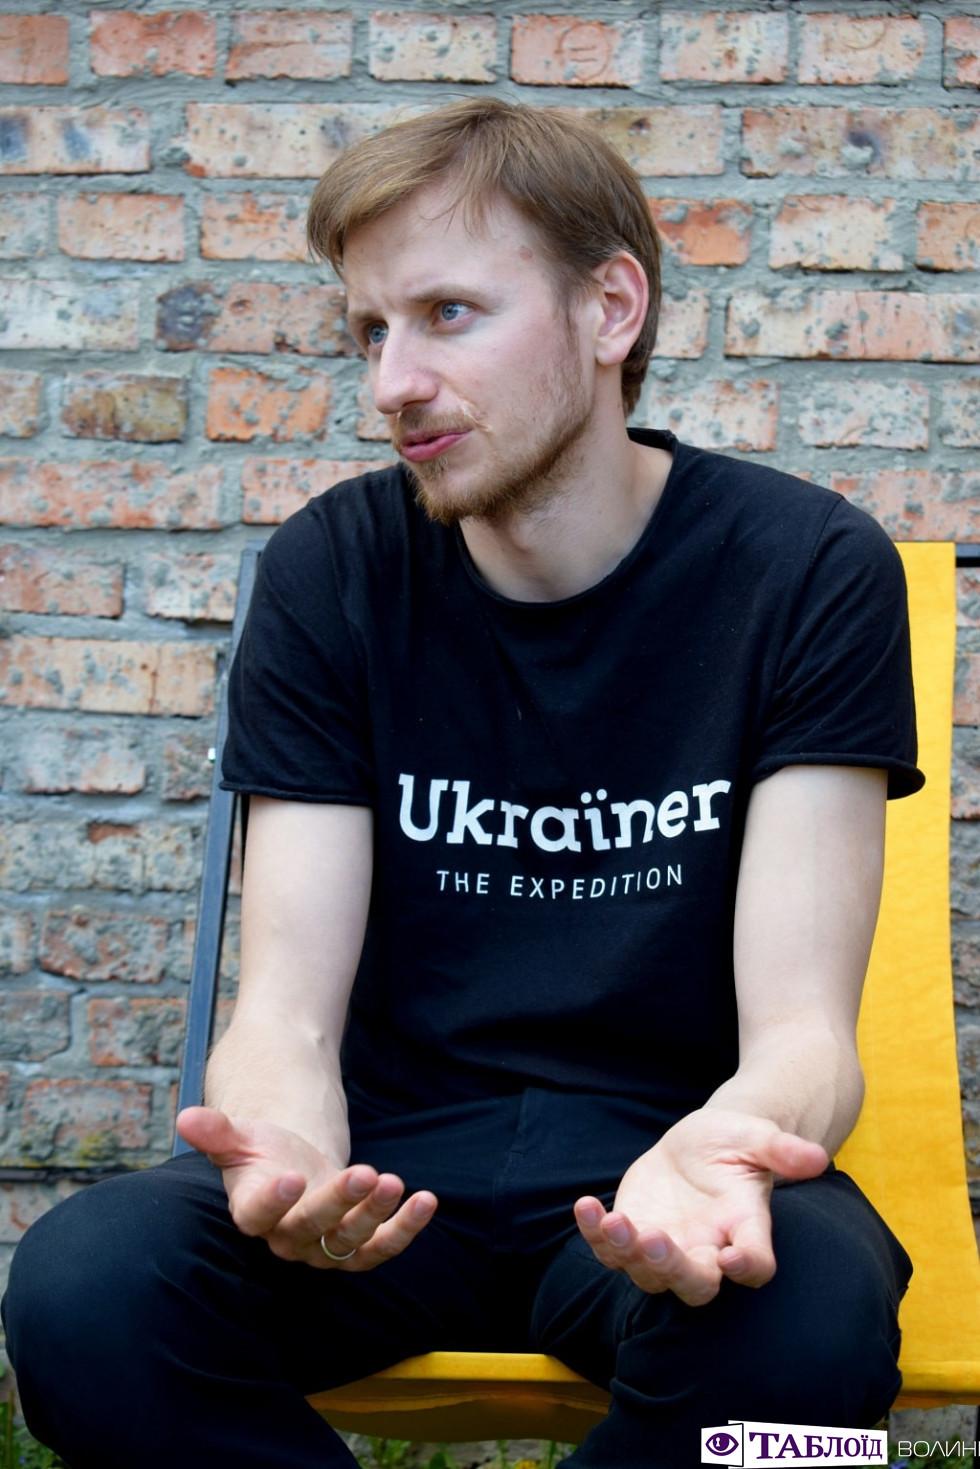 Автор проекту «Ukraїner» Богдан Логвиненко